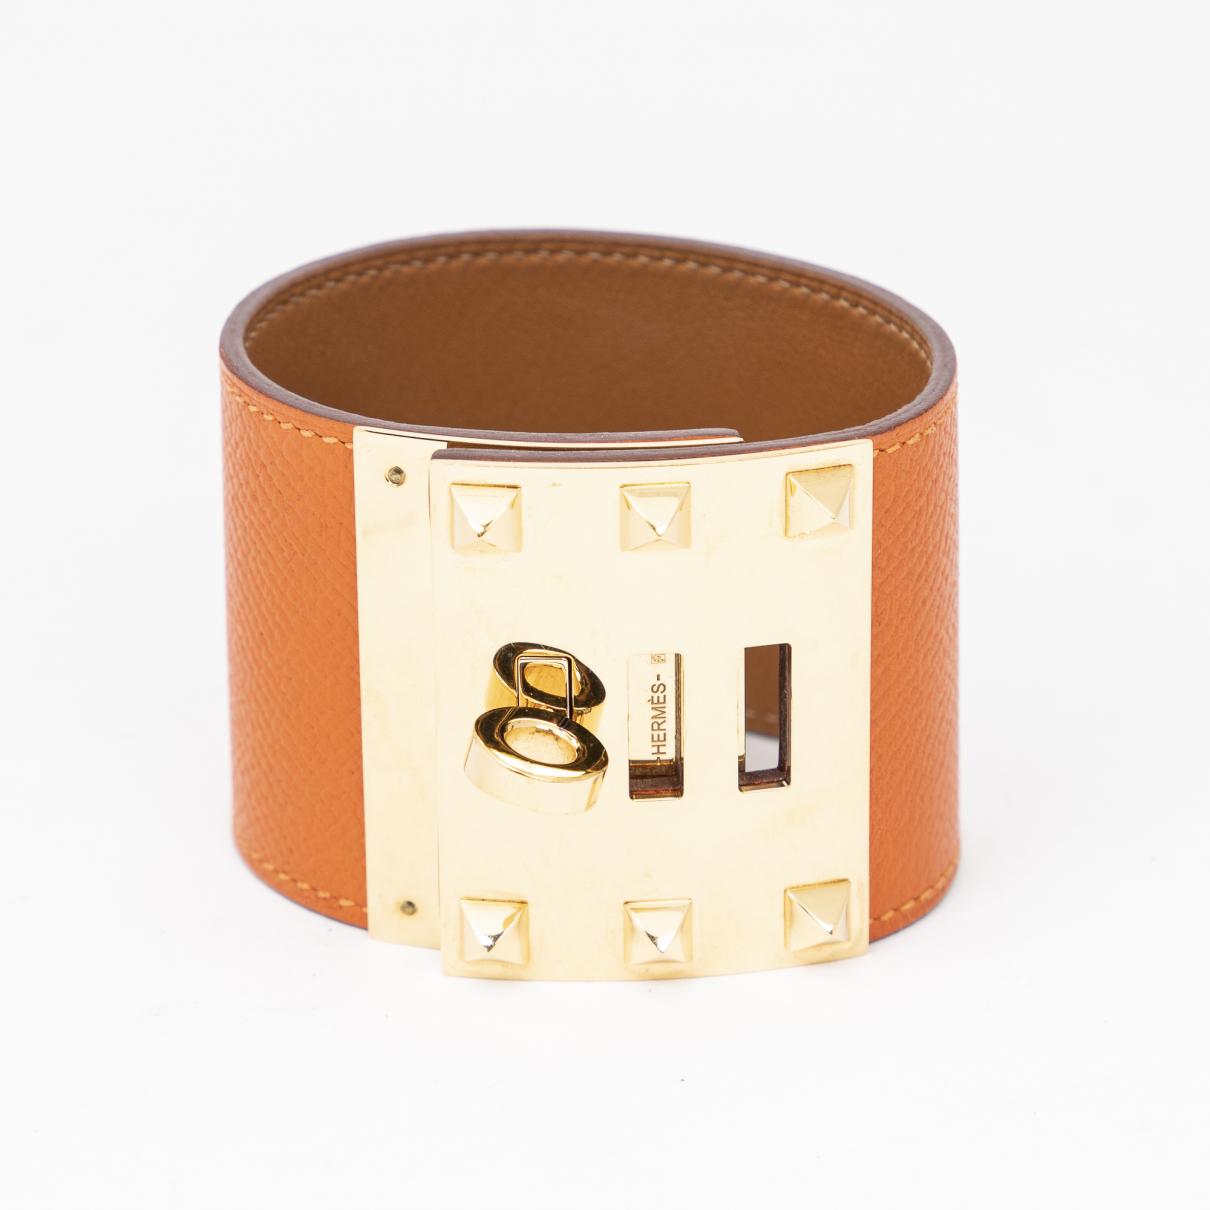 Hermes - Bracelet Kelly pour femme en cuir